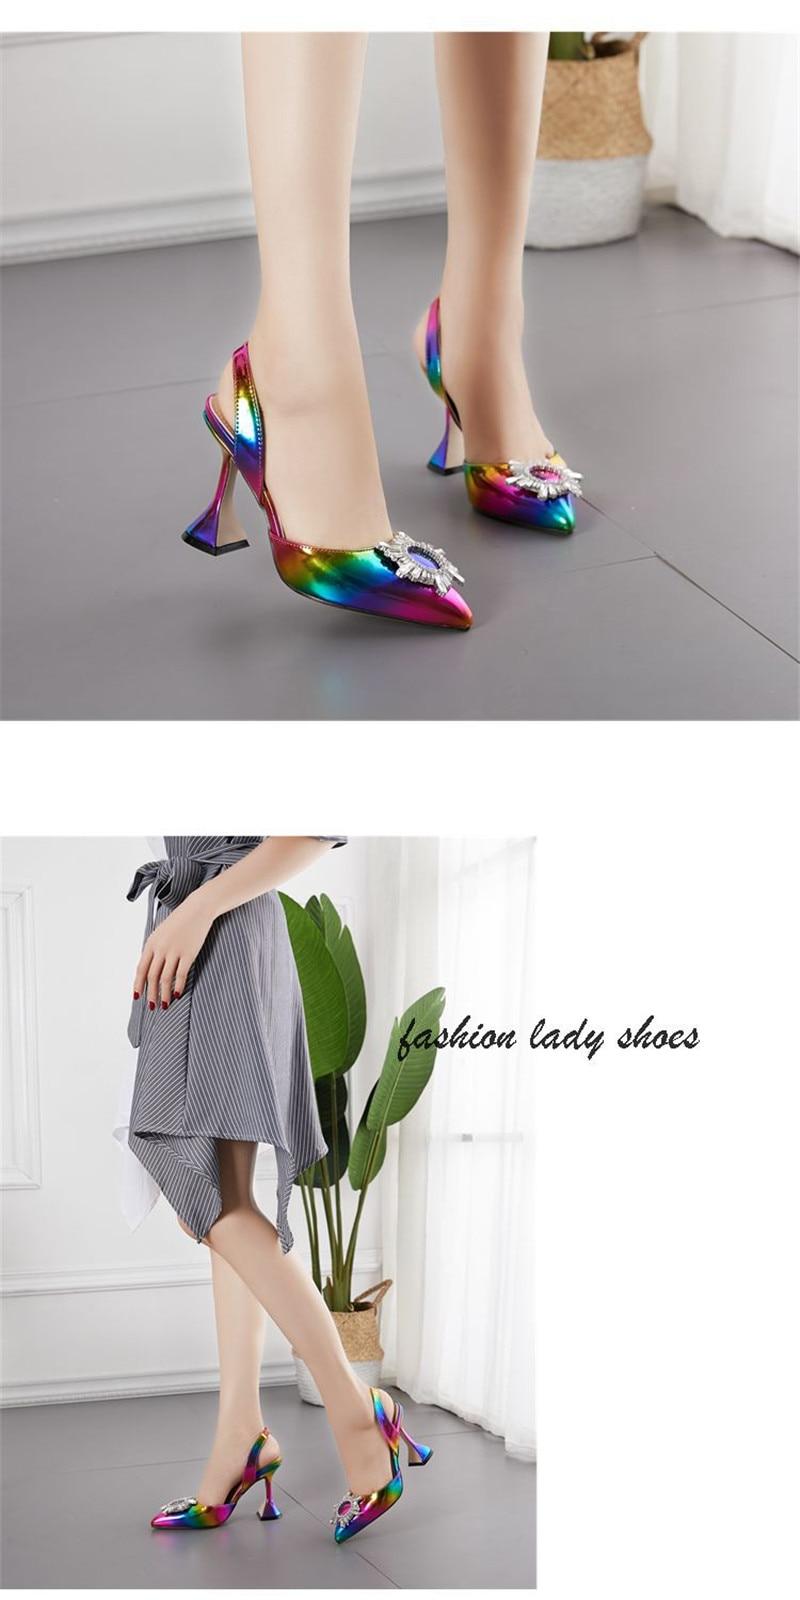 Summer 2020 Sandals Women`s Shoes Colorful High Heel Slingbacks Sun Flower Rhinestone Shallow Mouth Women`s Sandals Plus Size 42 (6)